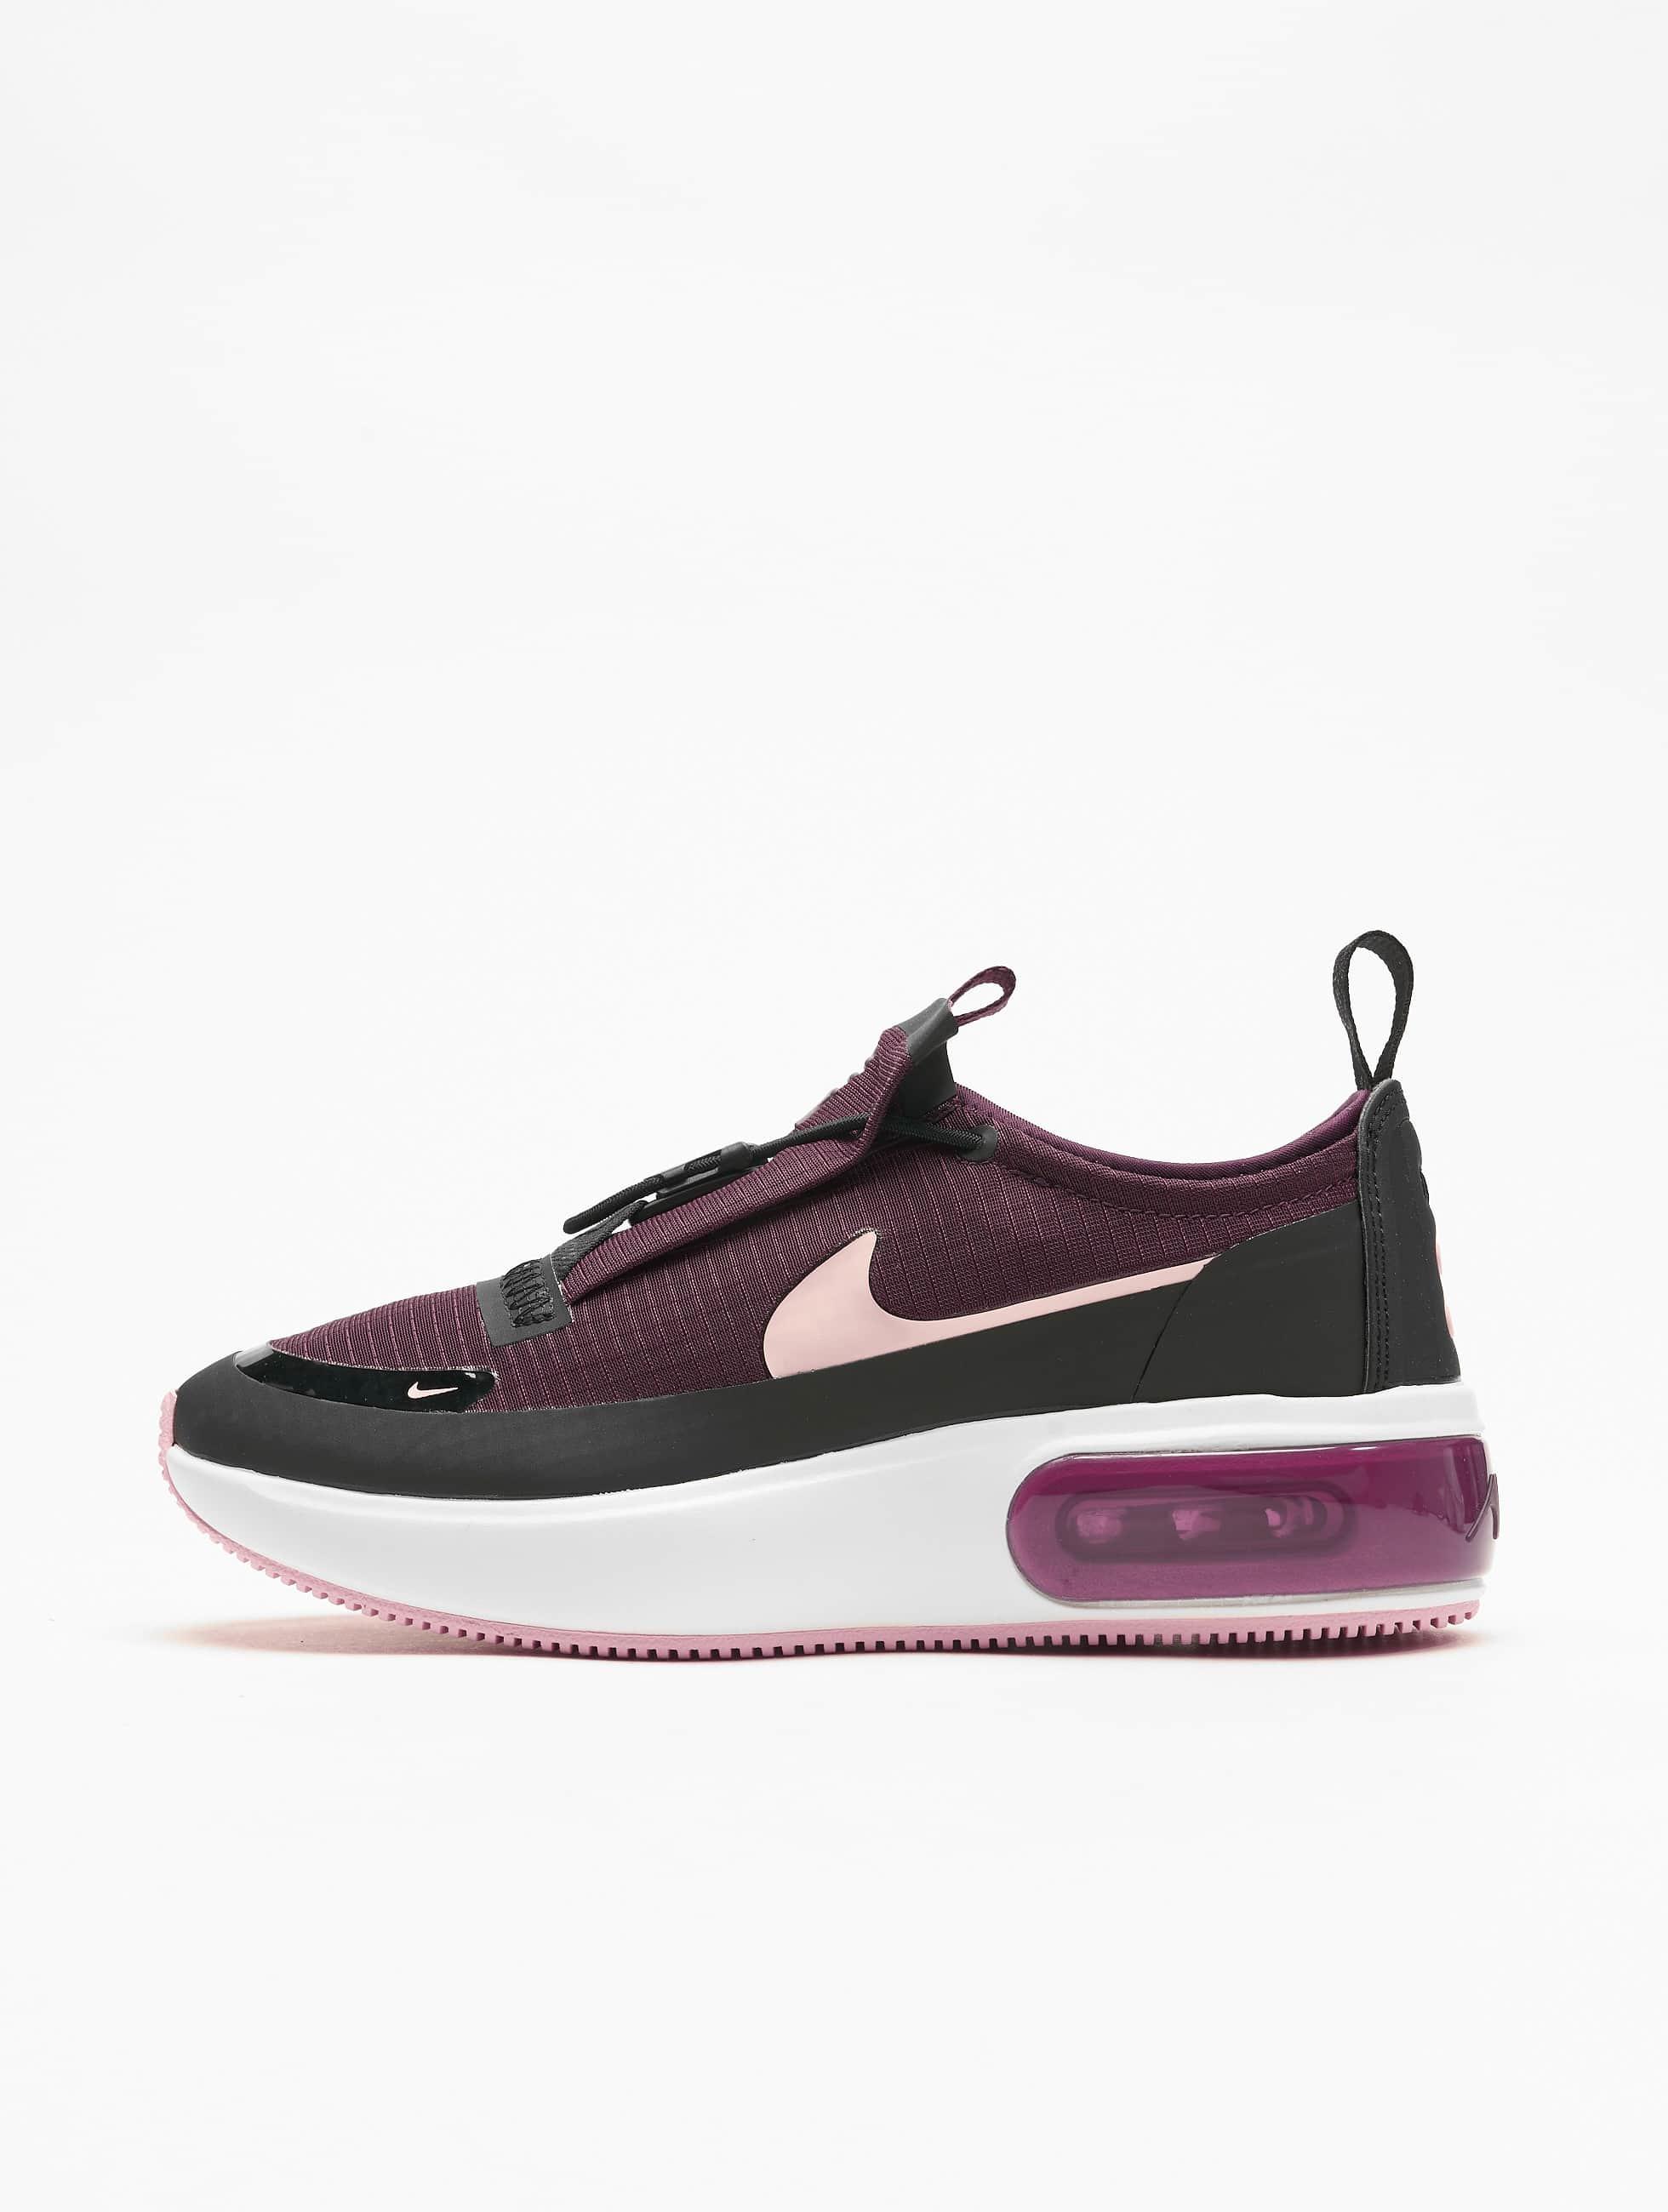 Nike Air Max Dia Winter Sneakers Night MaroonBleached CoralBlack